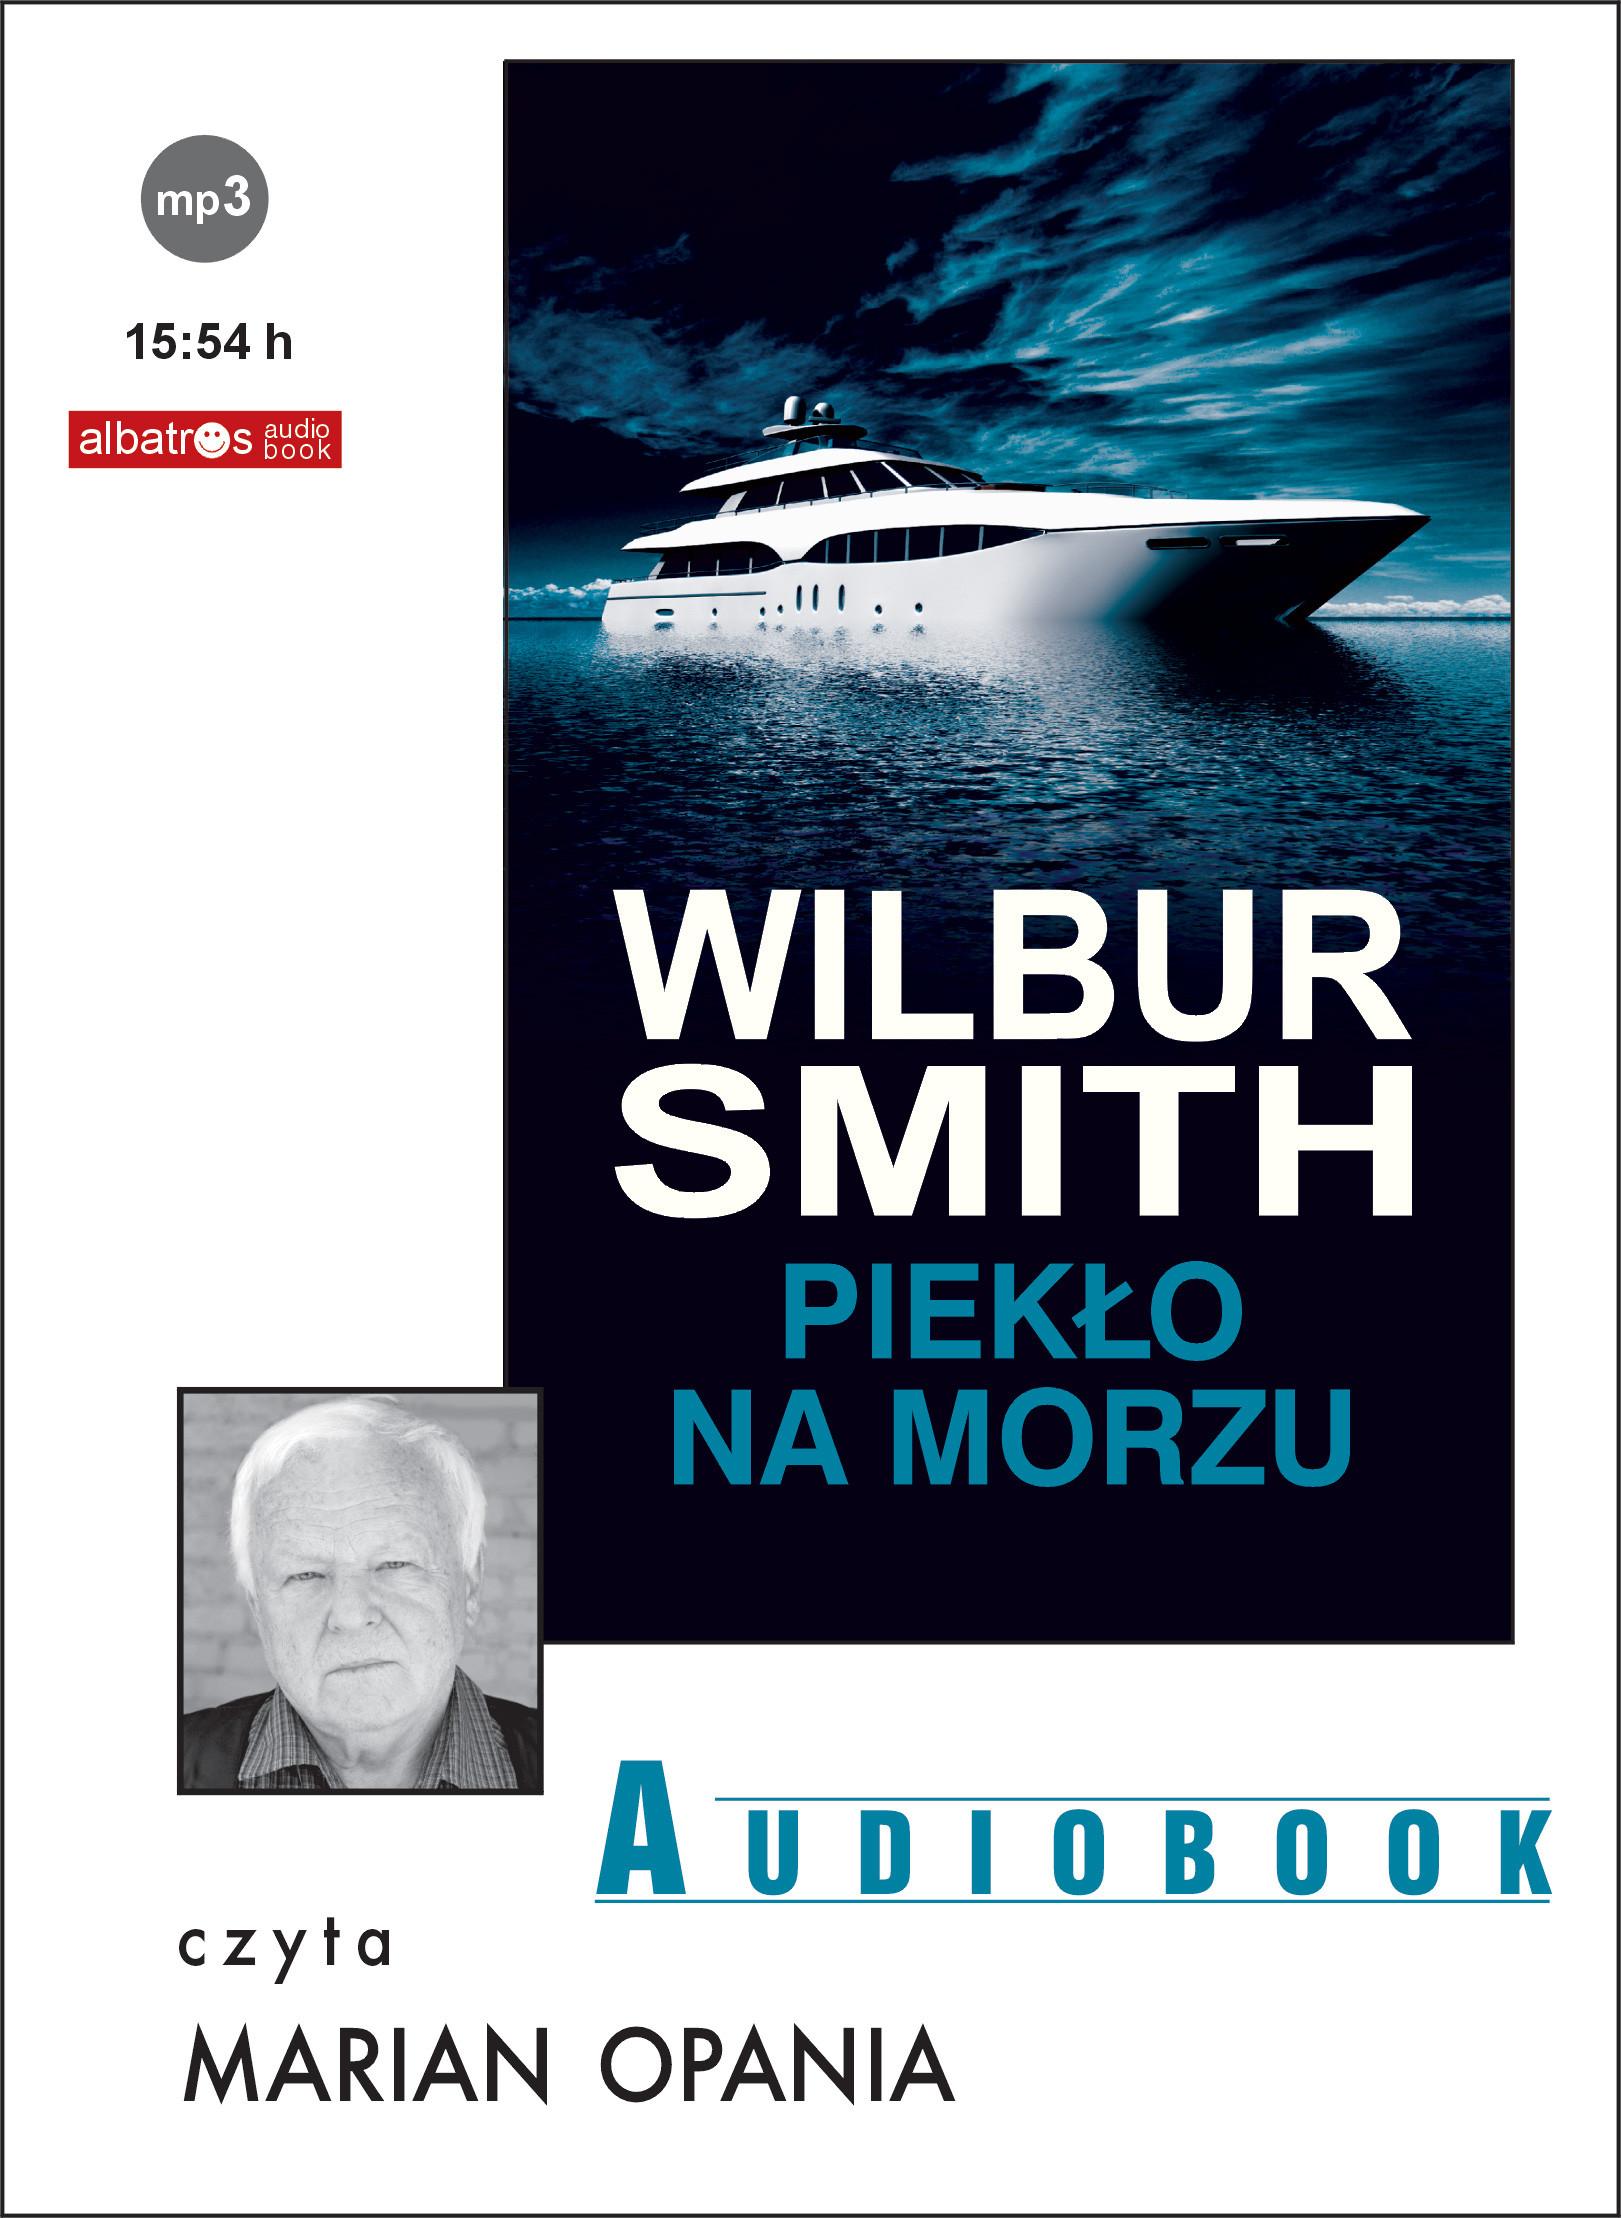 Piekło na morzu – audiobook.Autor: Wilbur Smith